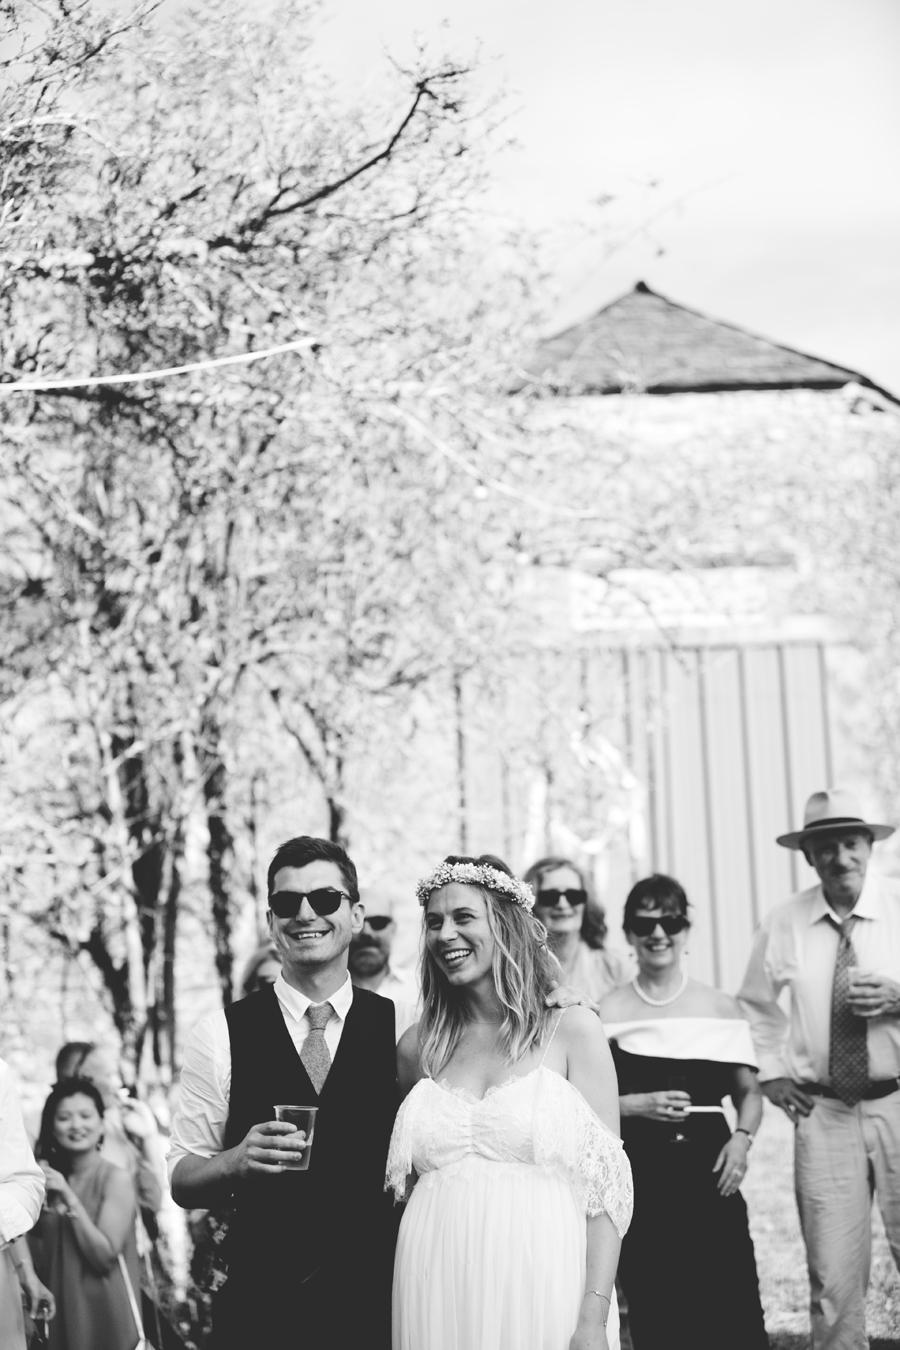 celine_marks_mariage_aurelie_keil_132